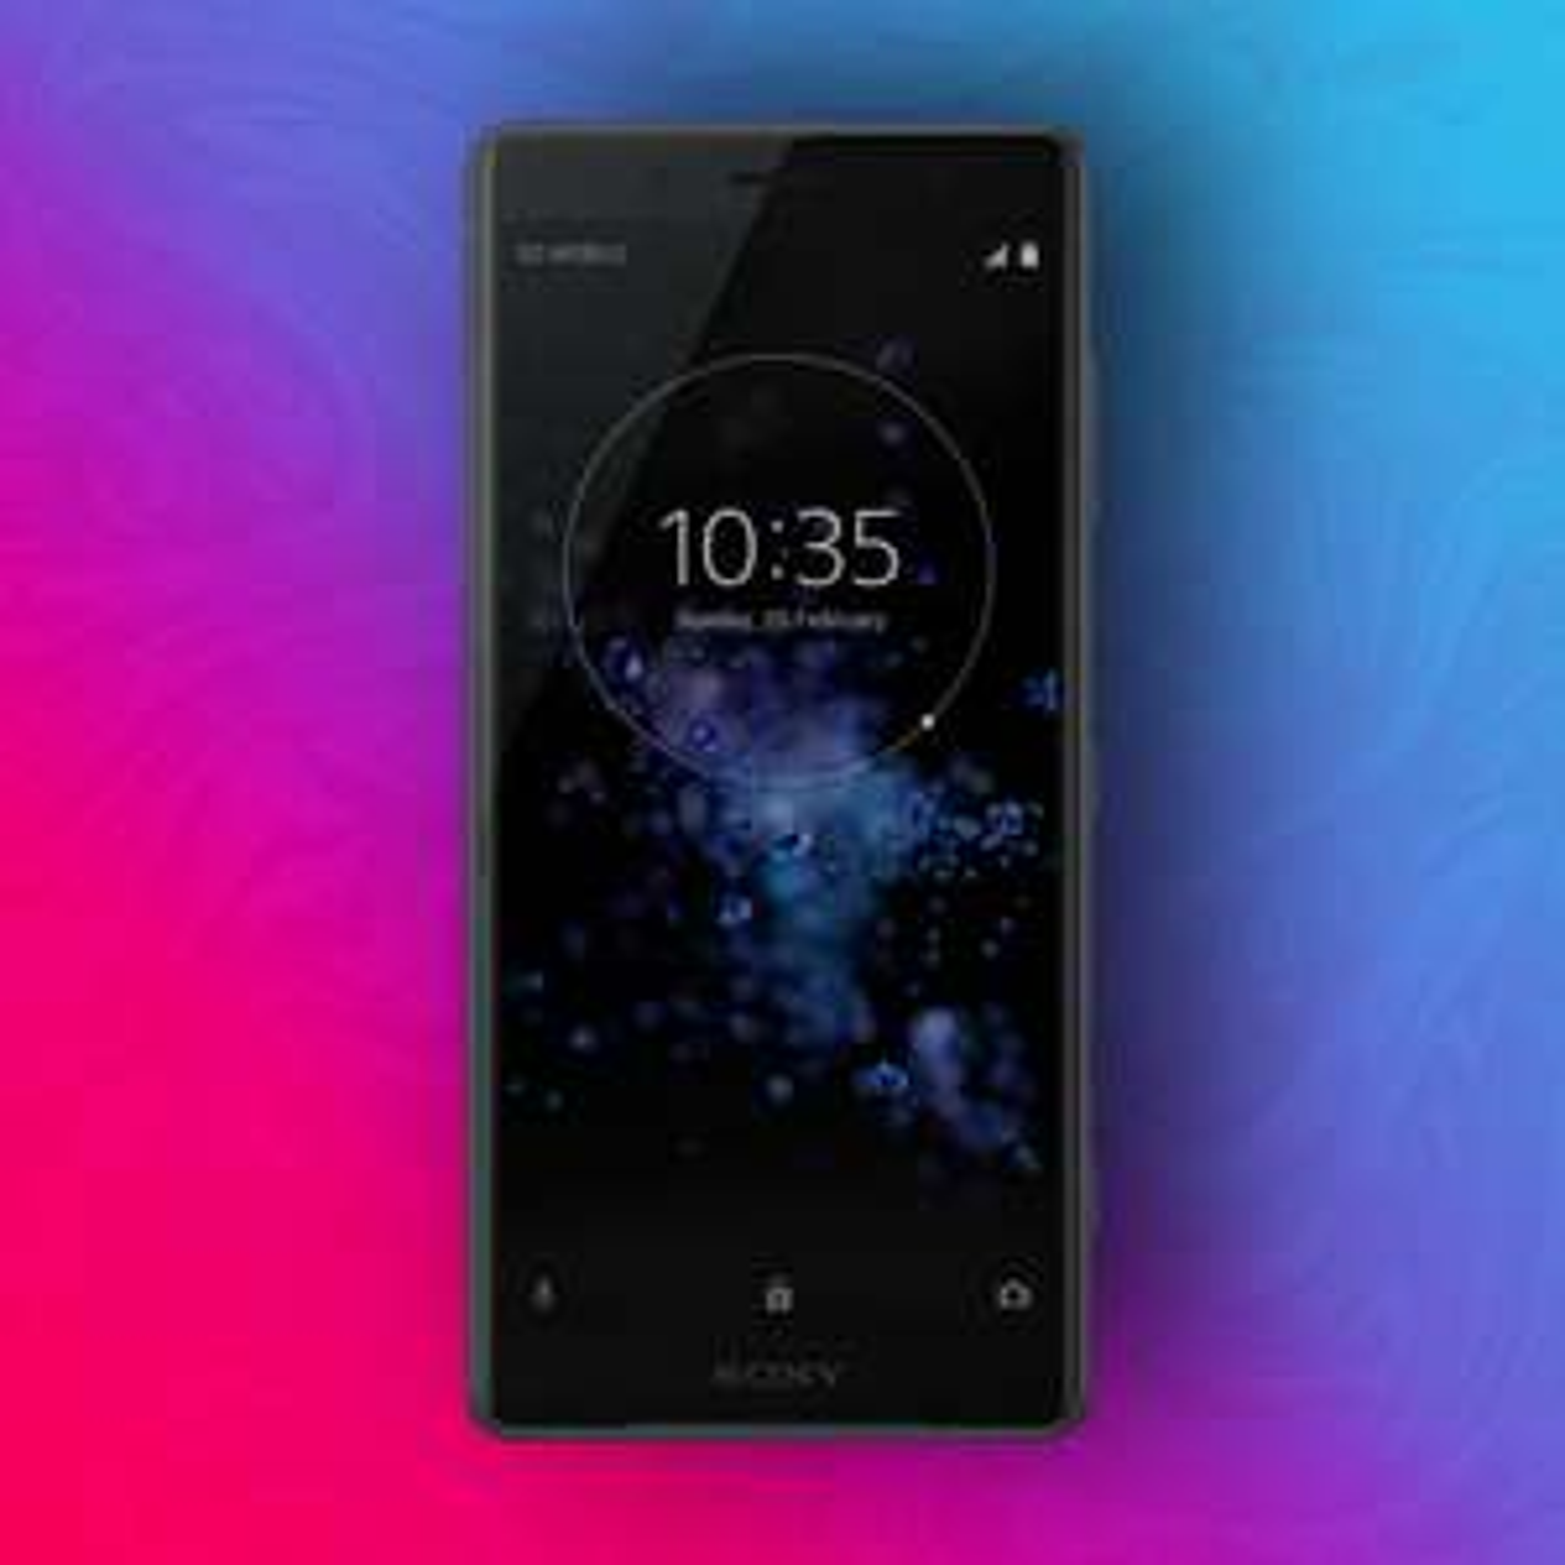 [Schweiz] Sony Xperia XZ2 Compact 64/4GB - Snapdragon 845 - 5 Zoll FHD - 19MP Kamera